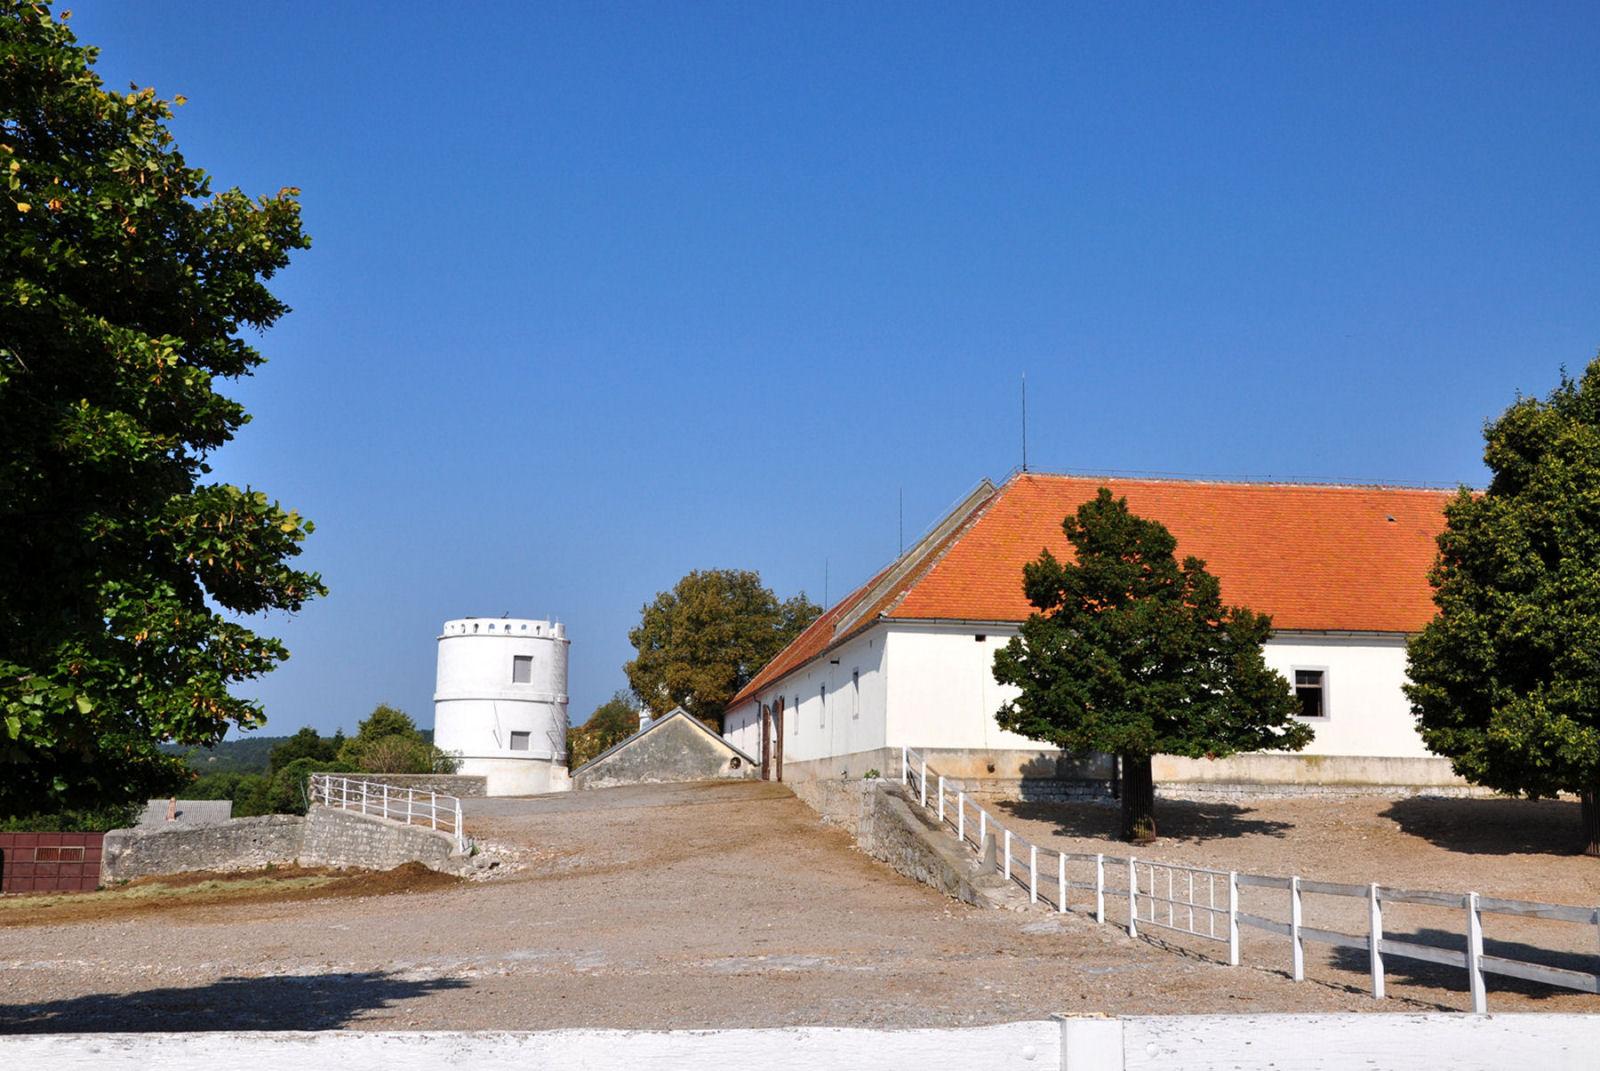 lipica-stud-farm-slovenia